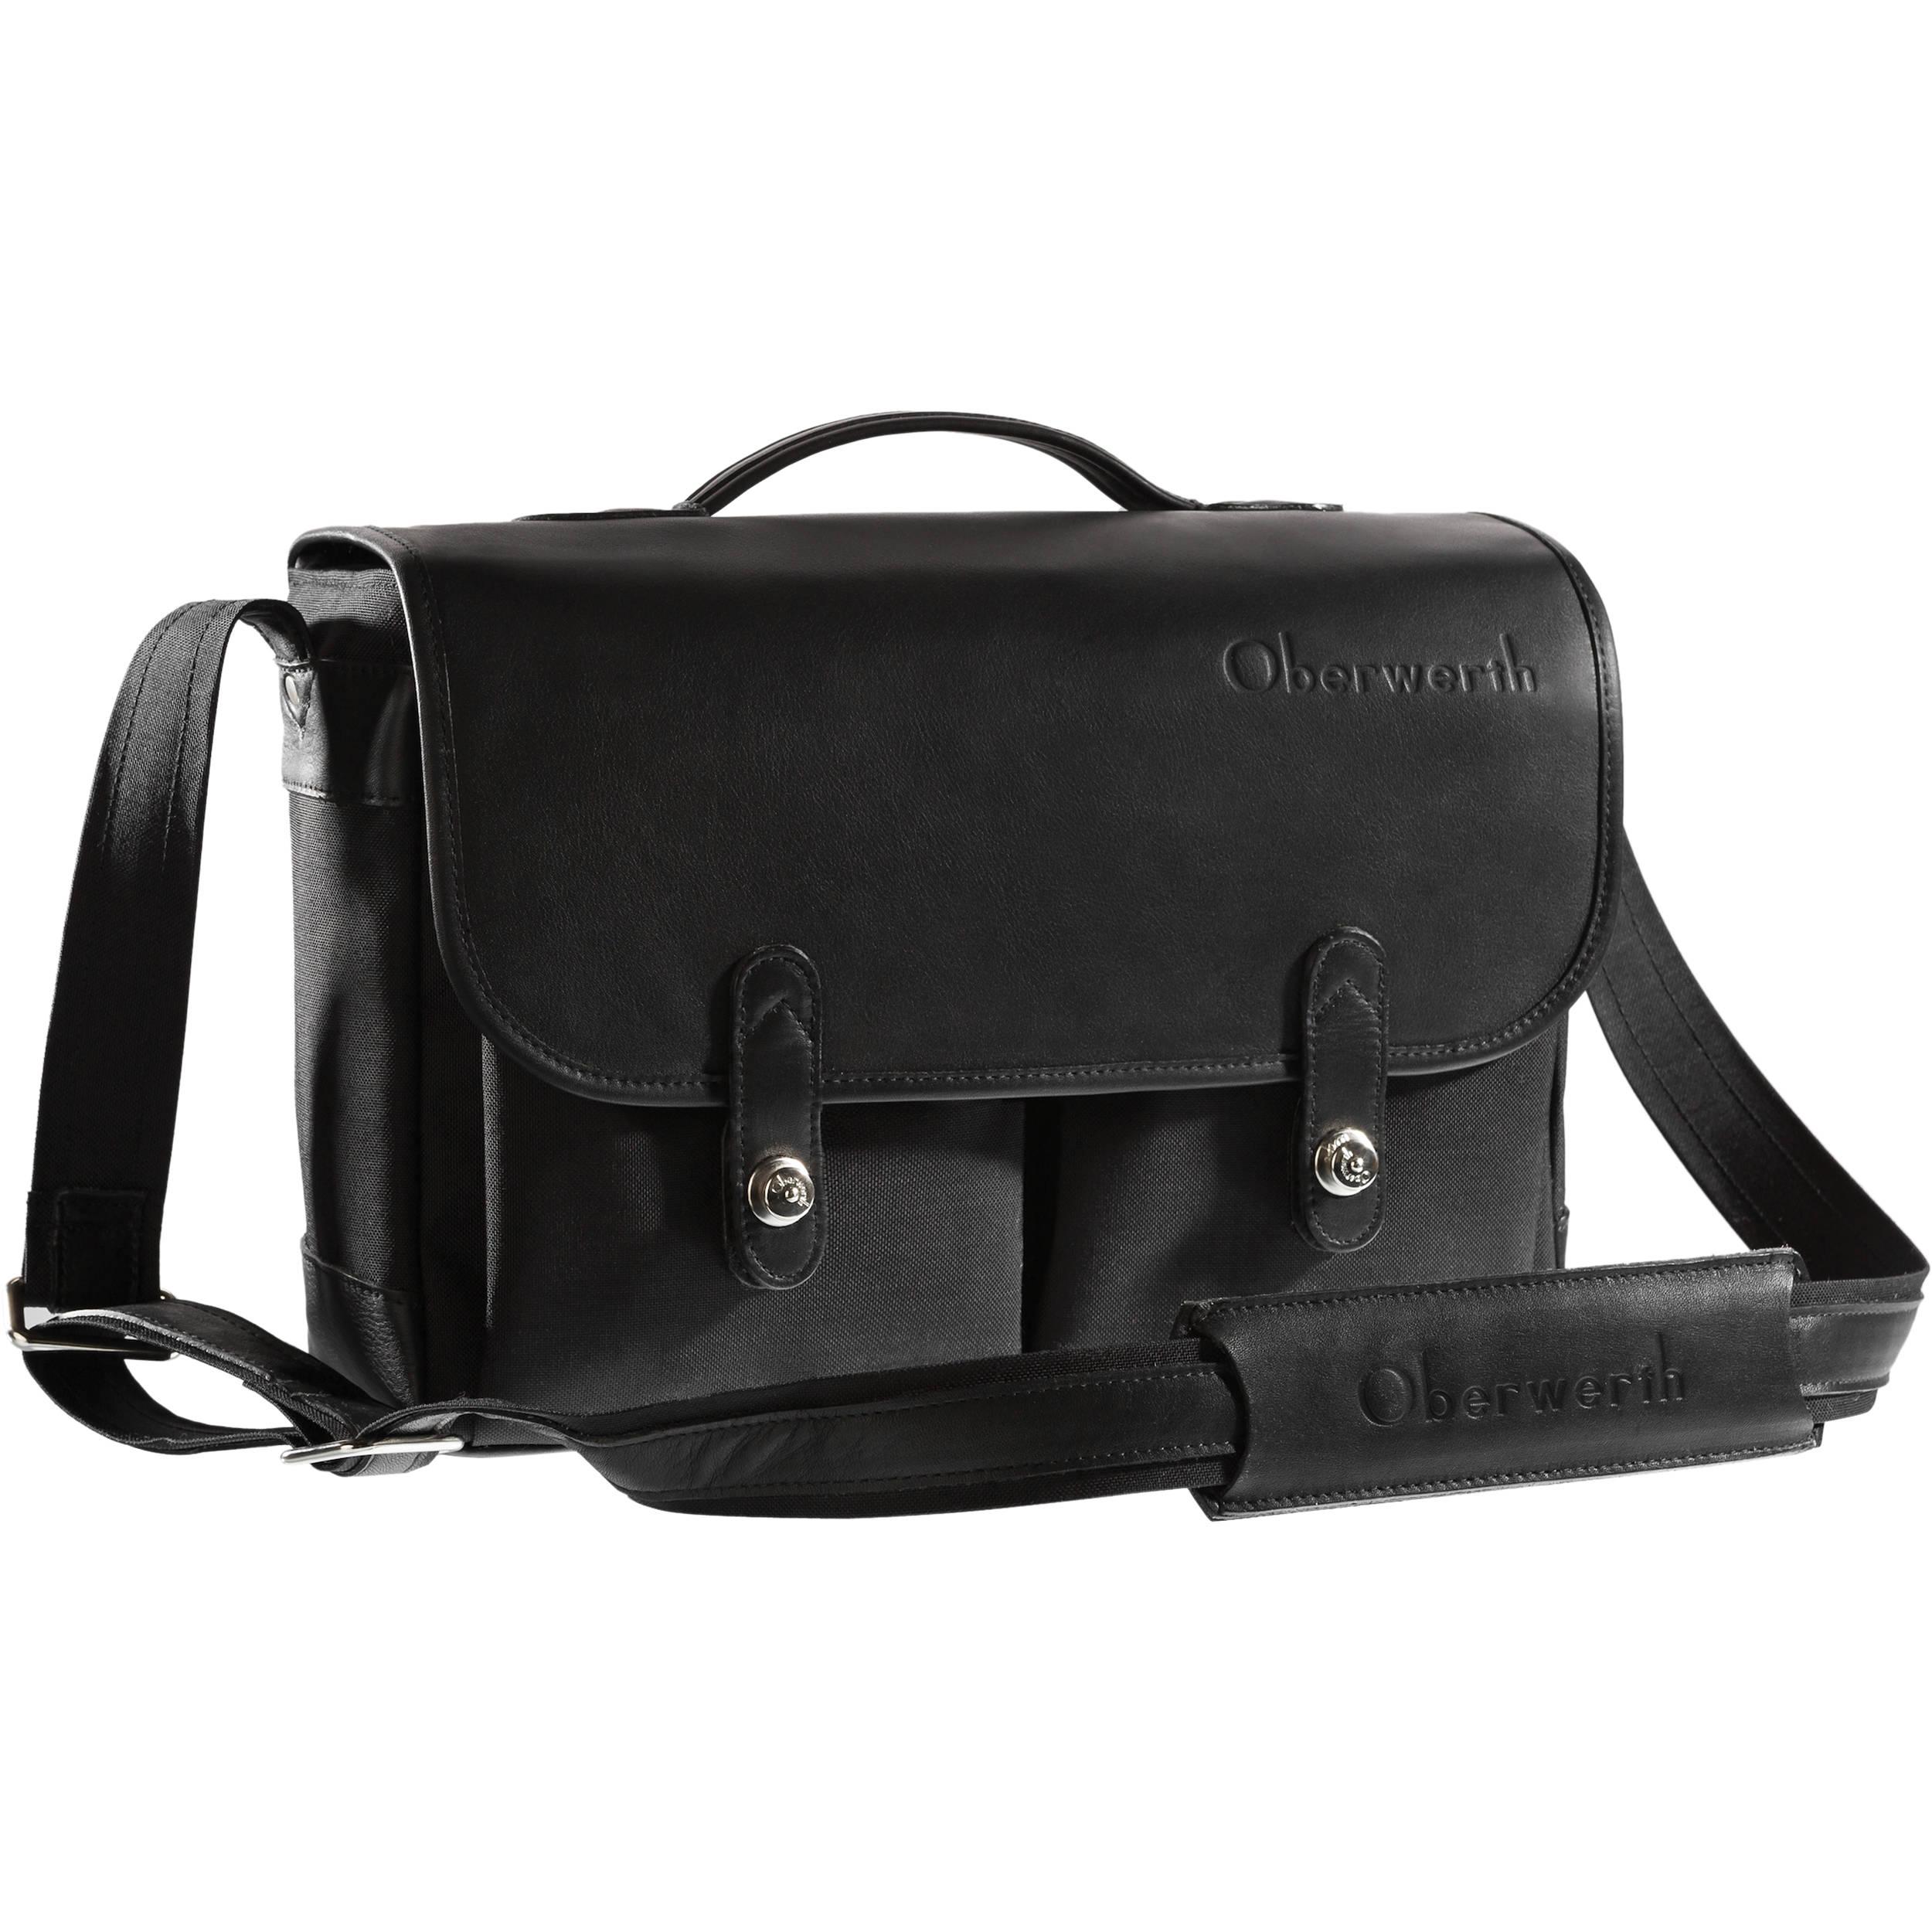 Oberwerth Munchen Large Camera Bag Black